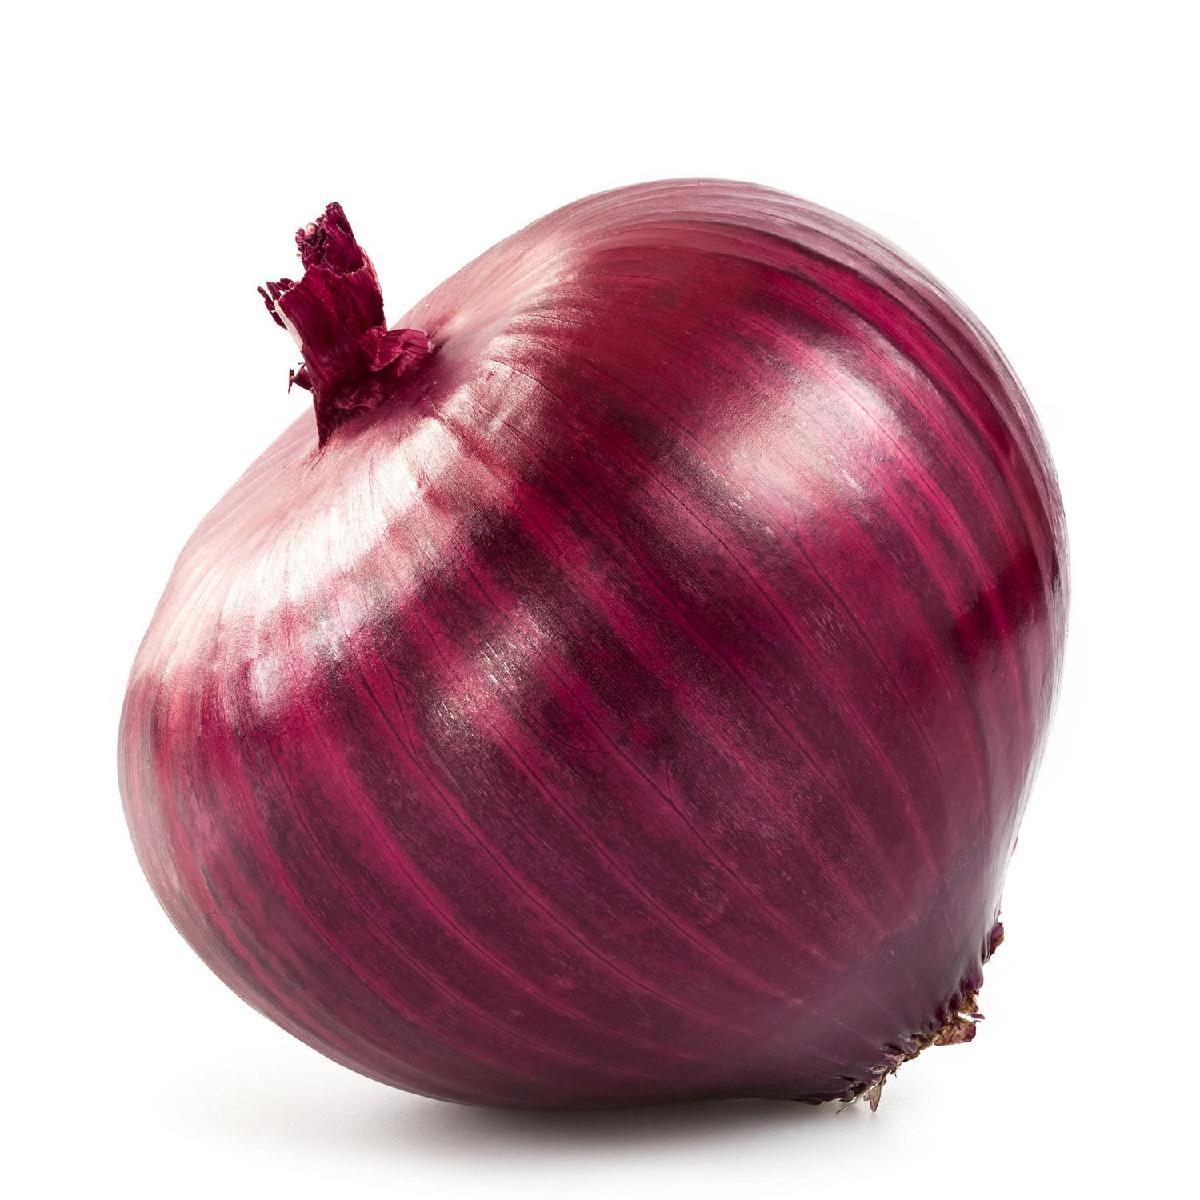 fresh onion for sale